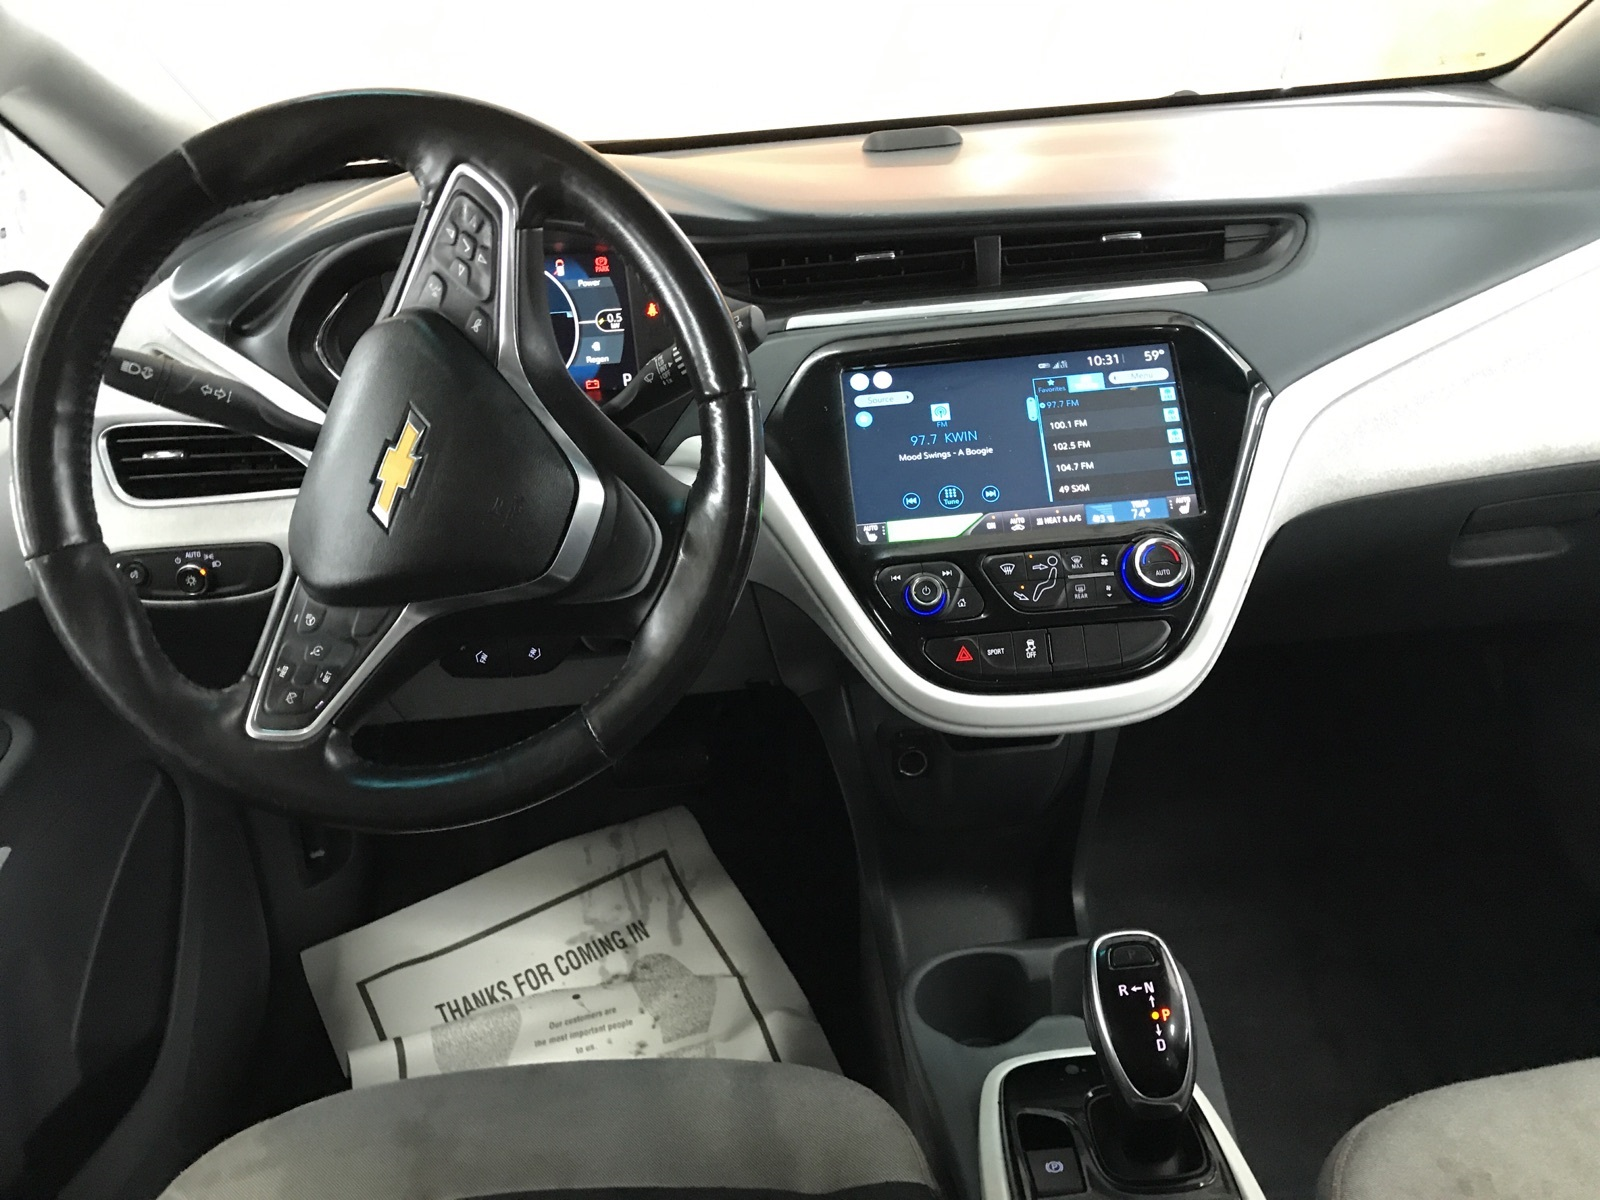 http://autocredit.com.ua/electro-cars/uploads/12/21-02-20/gS47Xi_ar7MJoPD4w.jpeg